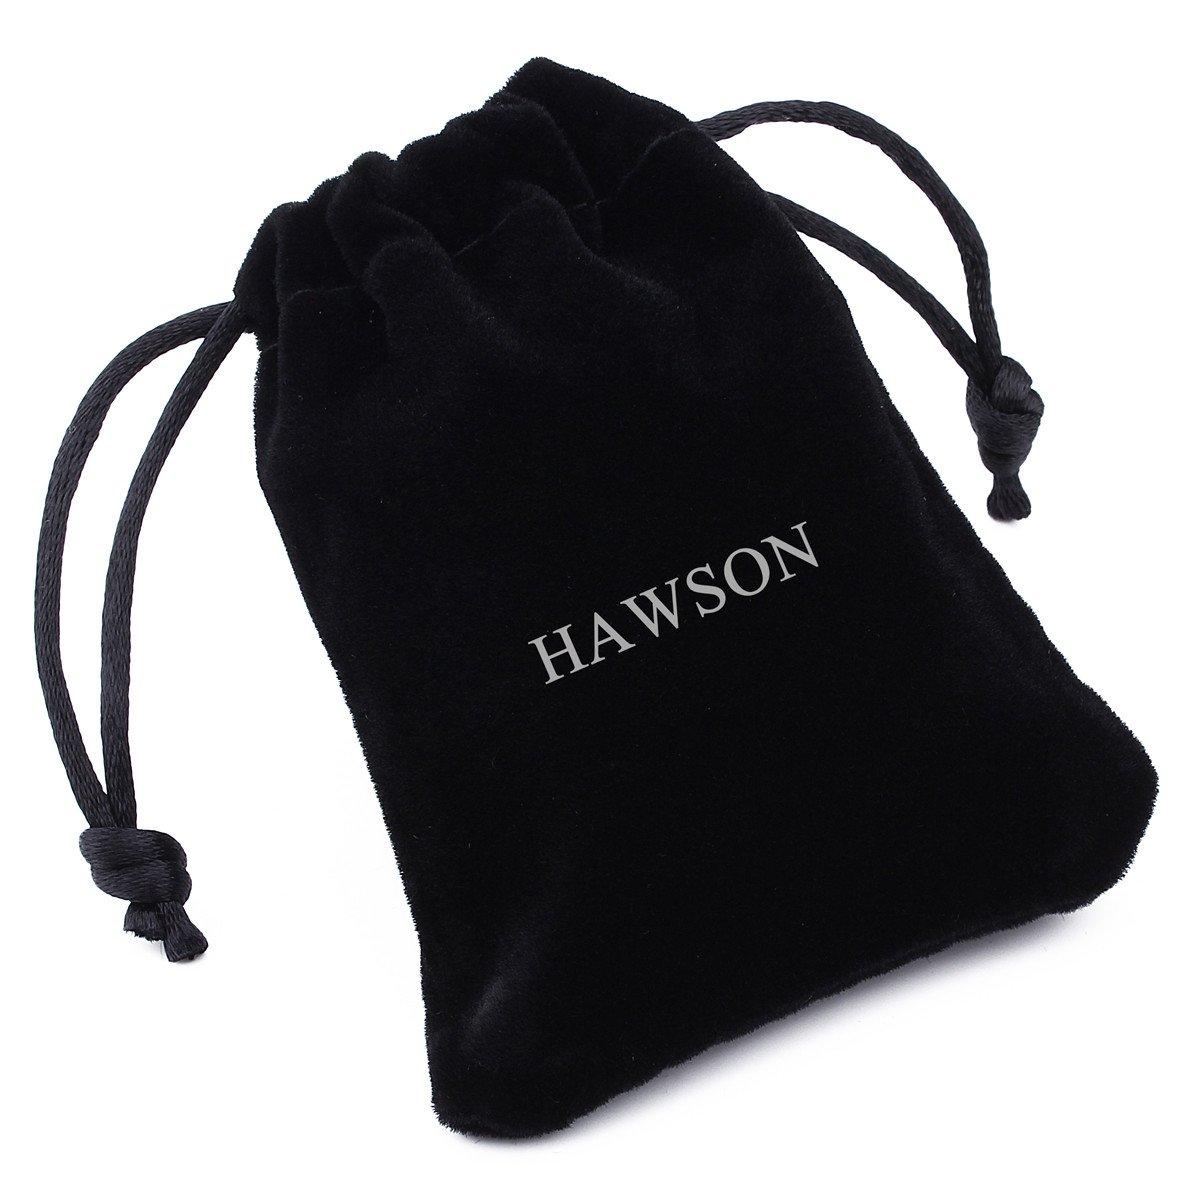 HAWSON Gold Cufflinks and Tuxedo Studs Set for Mens Wedding Business by HAWSON (Image #5)